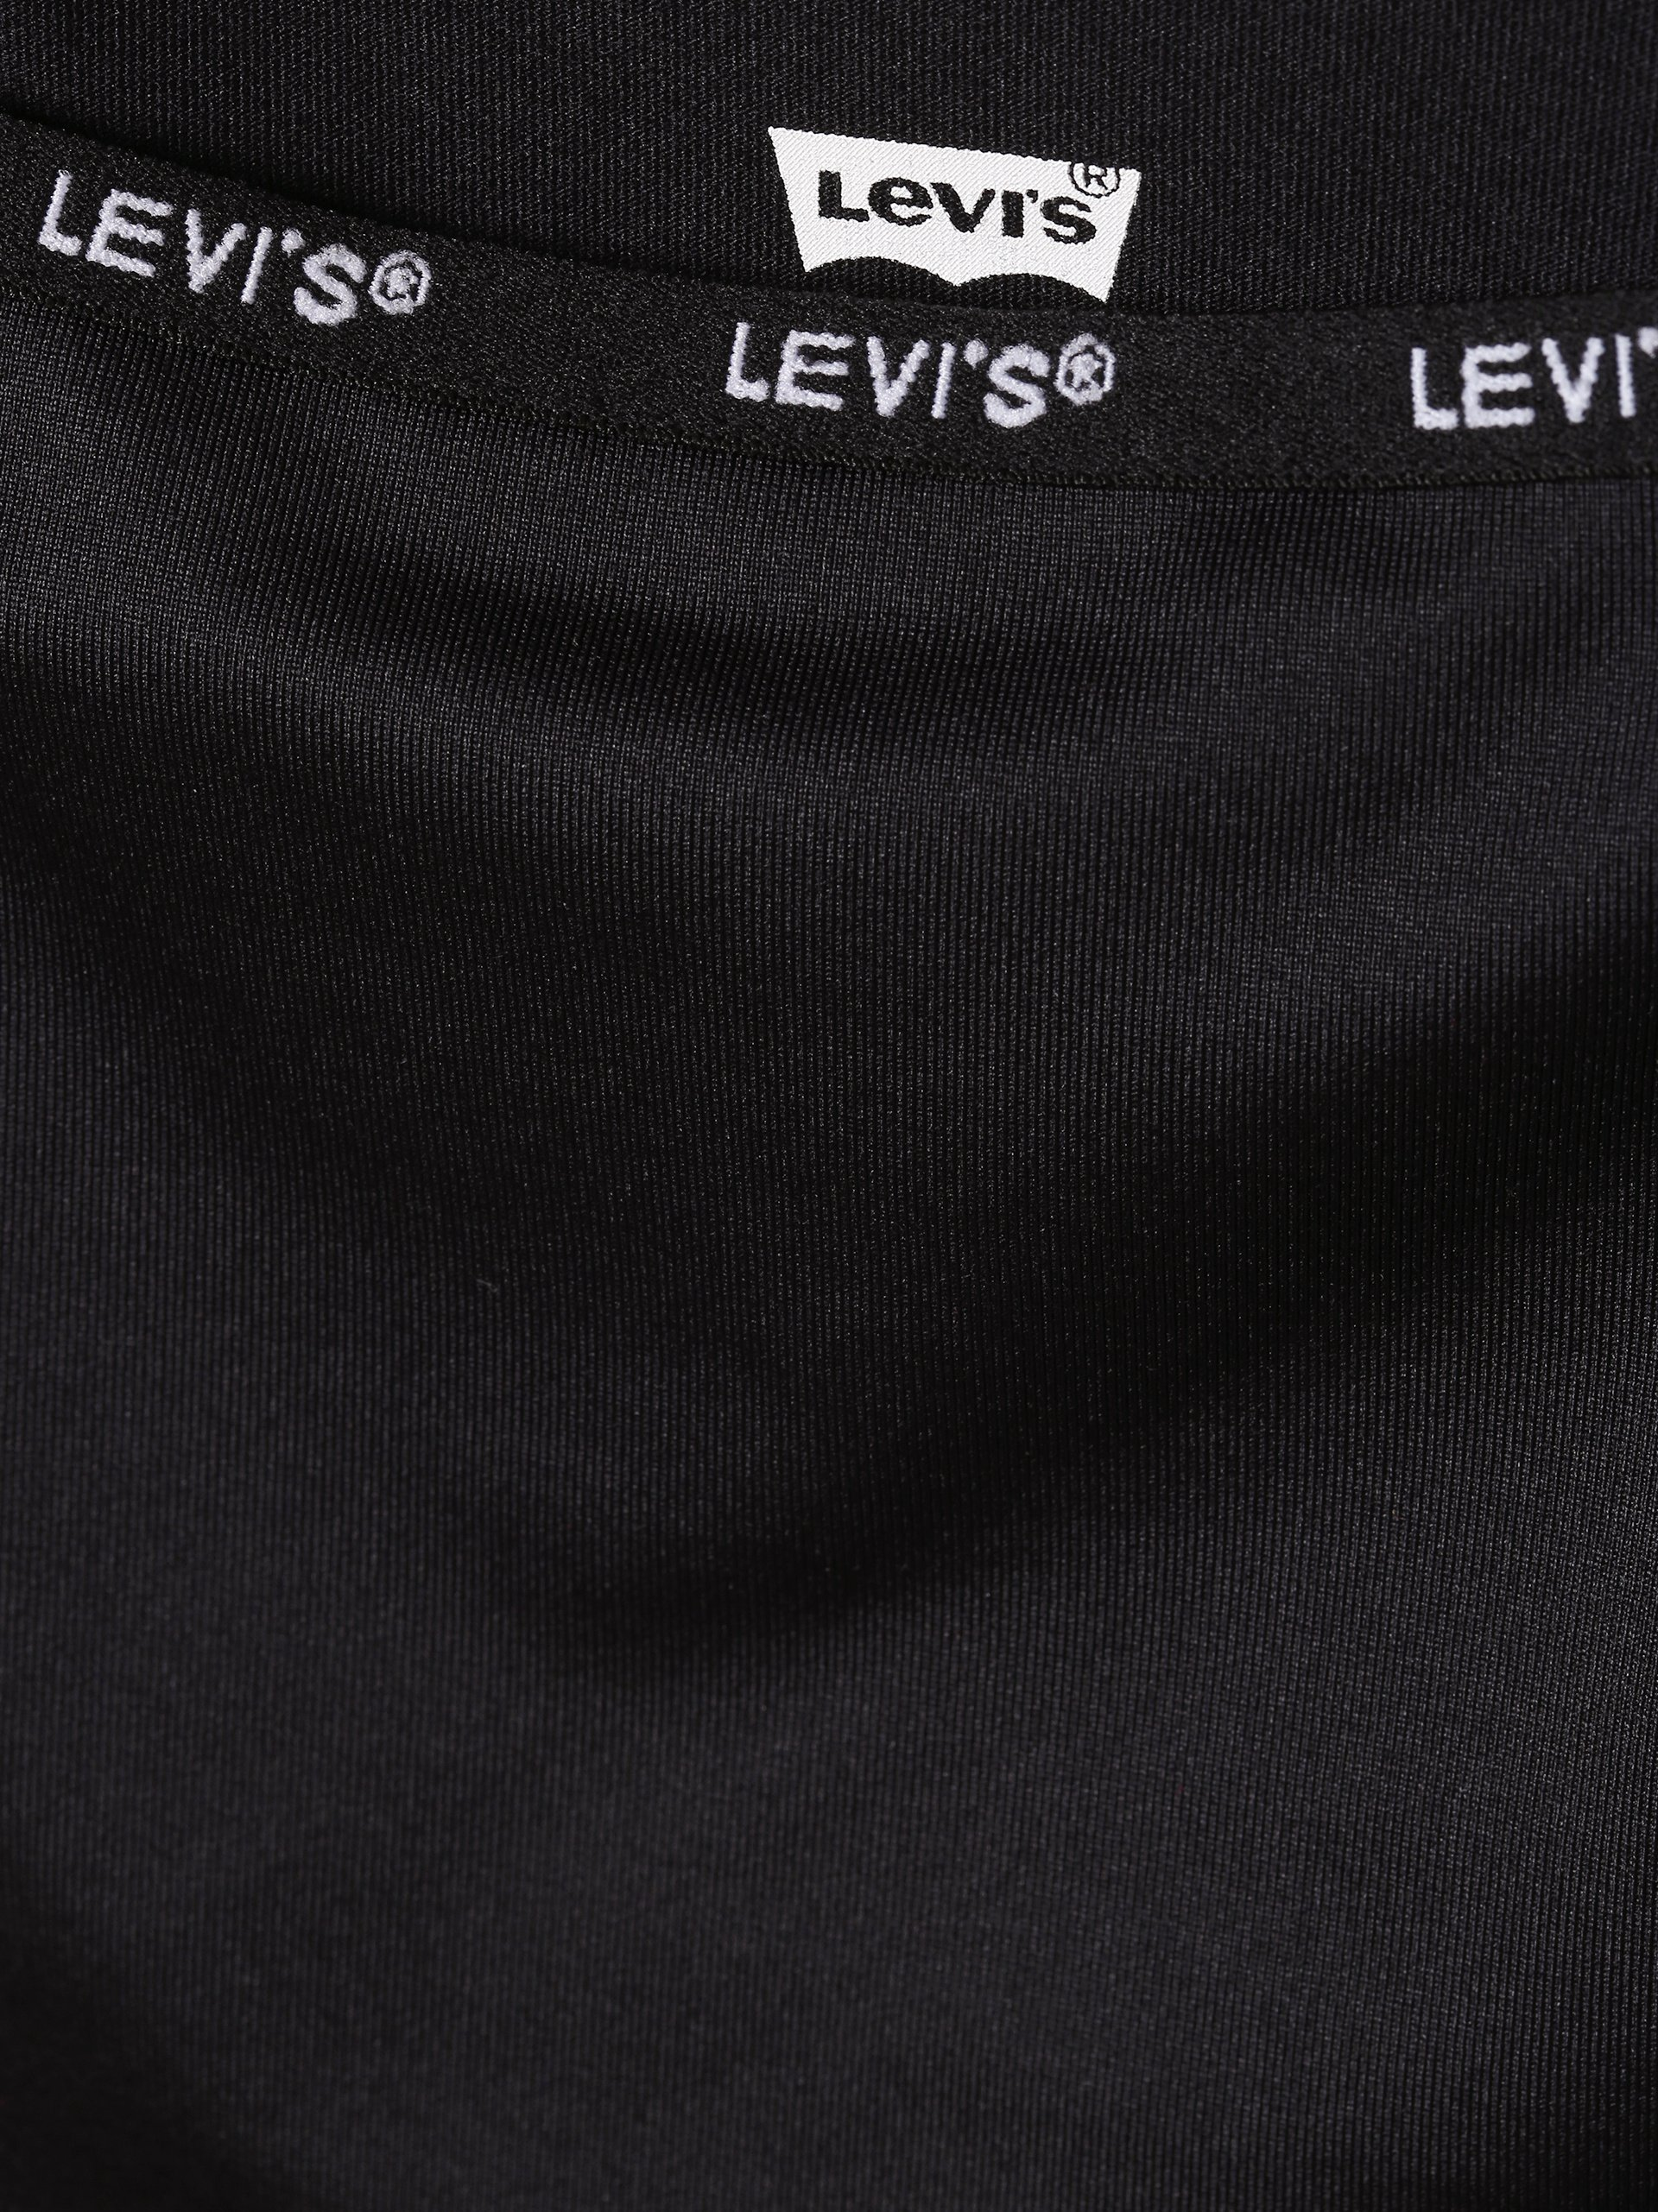 Levi\'s Damen Top